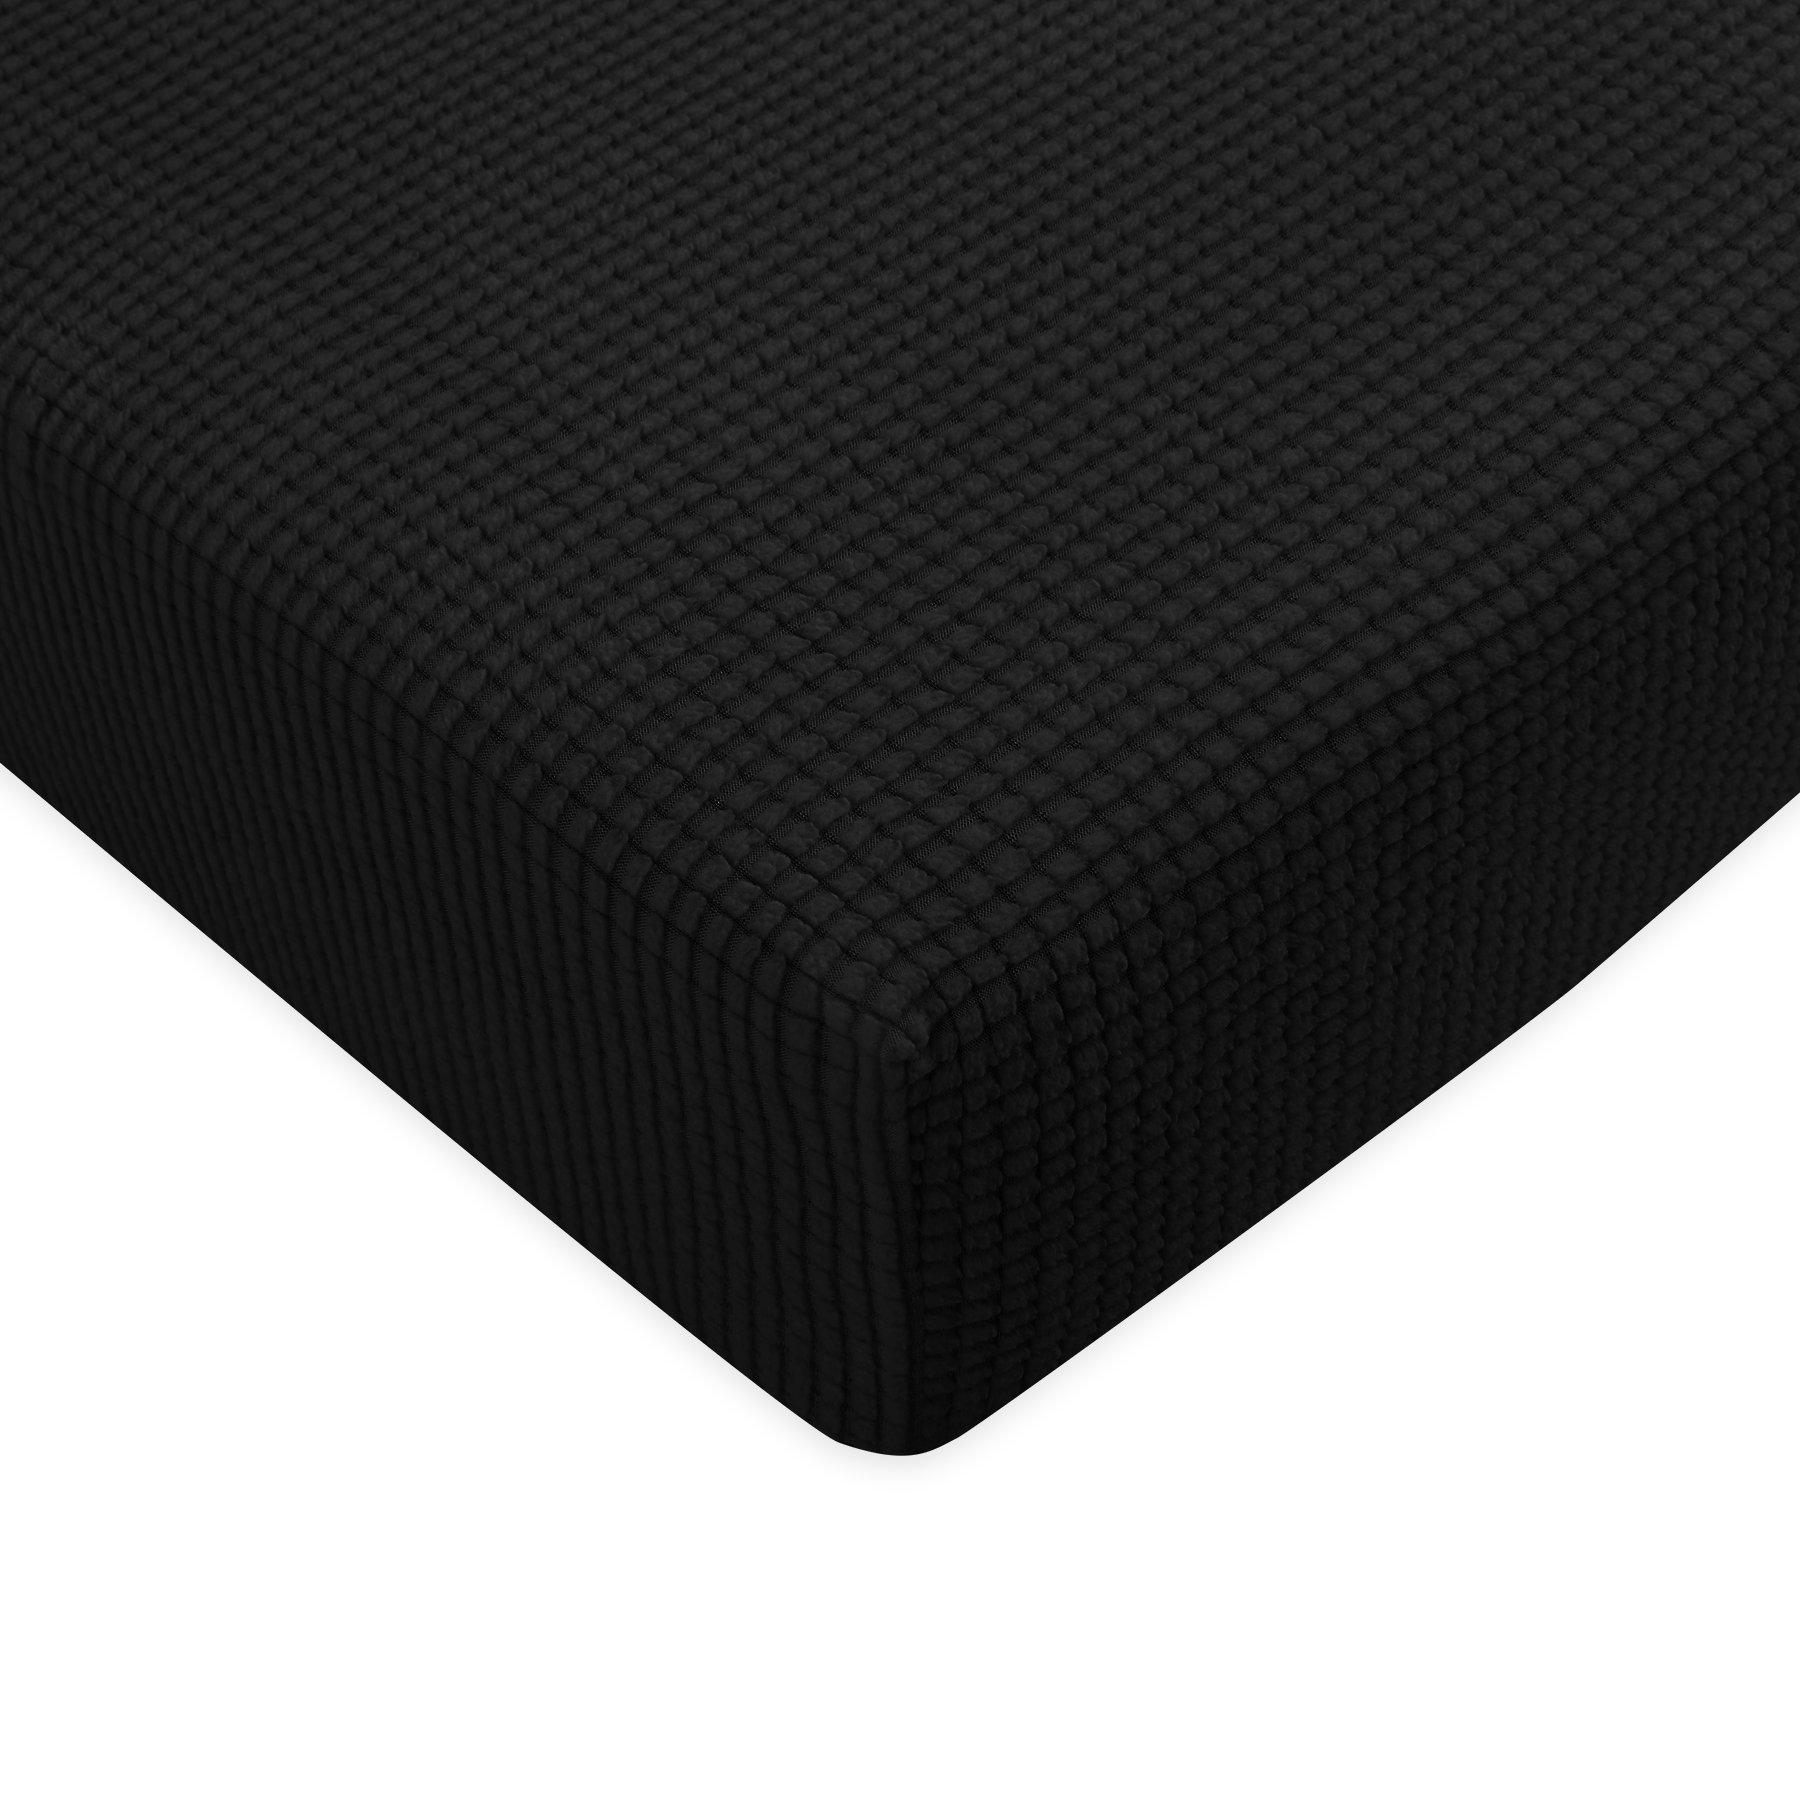 Subrtex Stretch Spandex Protector Slipcover(Chair Cushion, Black)